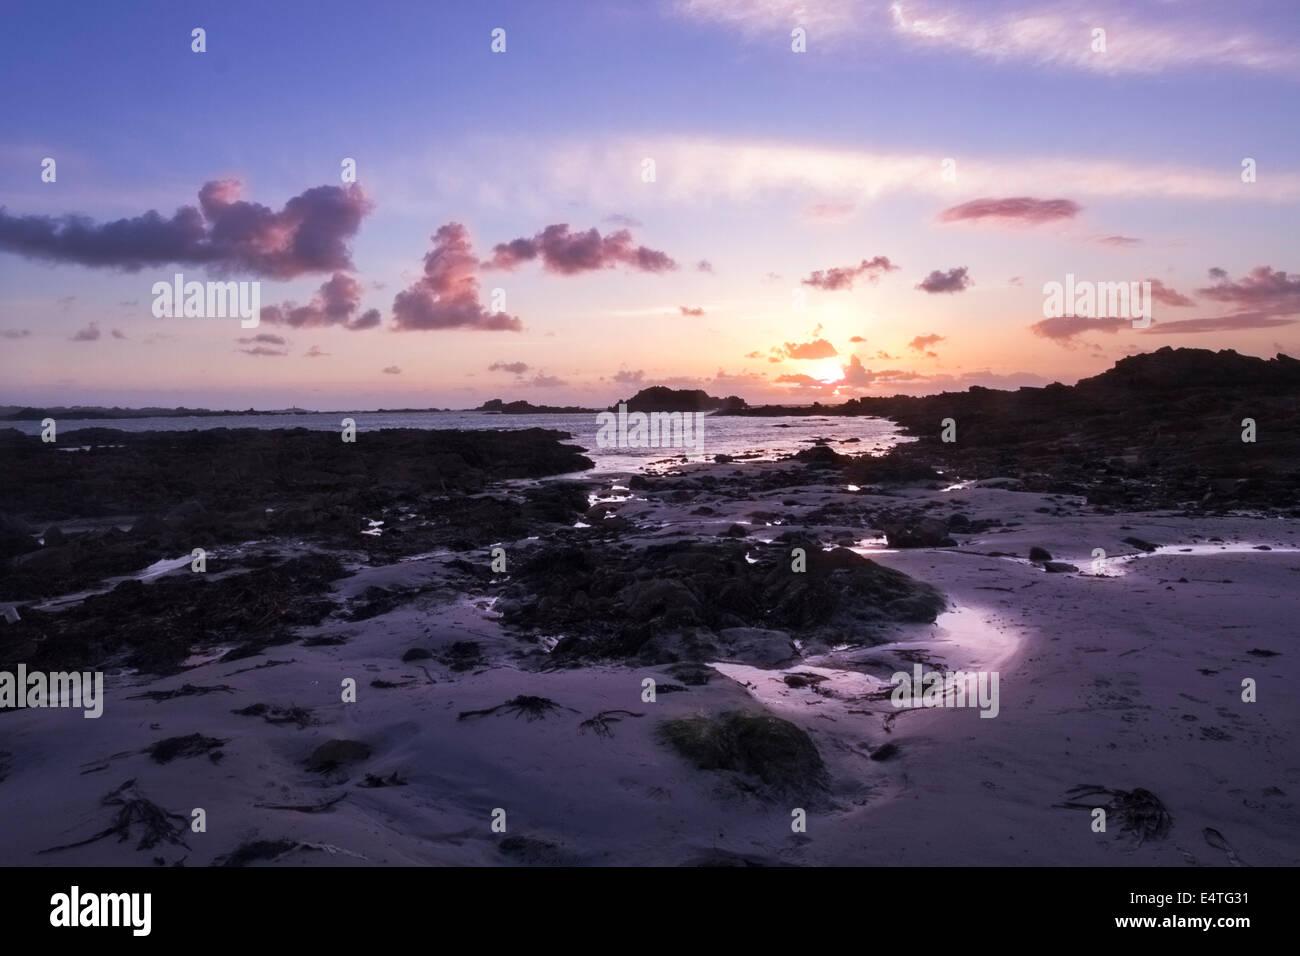 Sunset on guernsey english channel islands UK - Stock Image